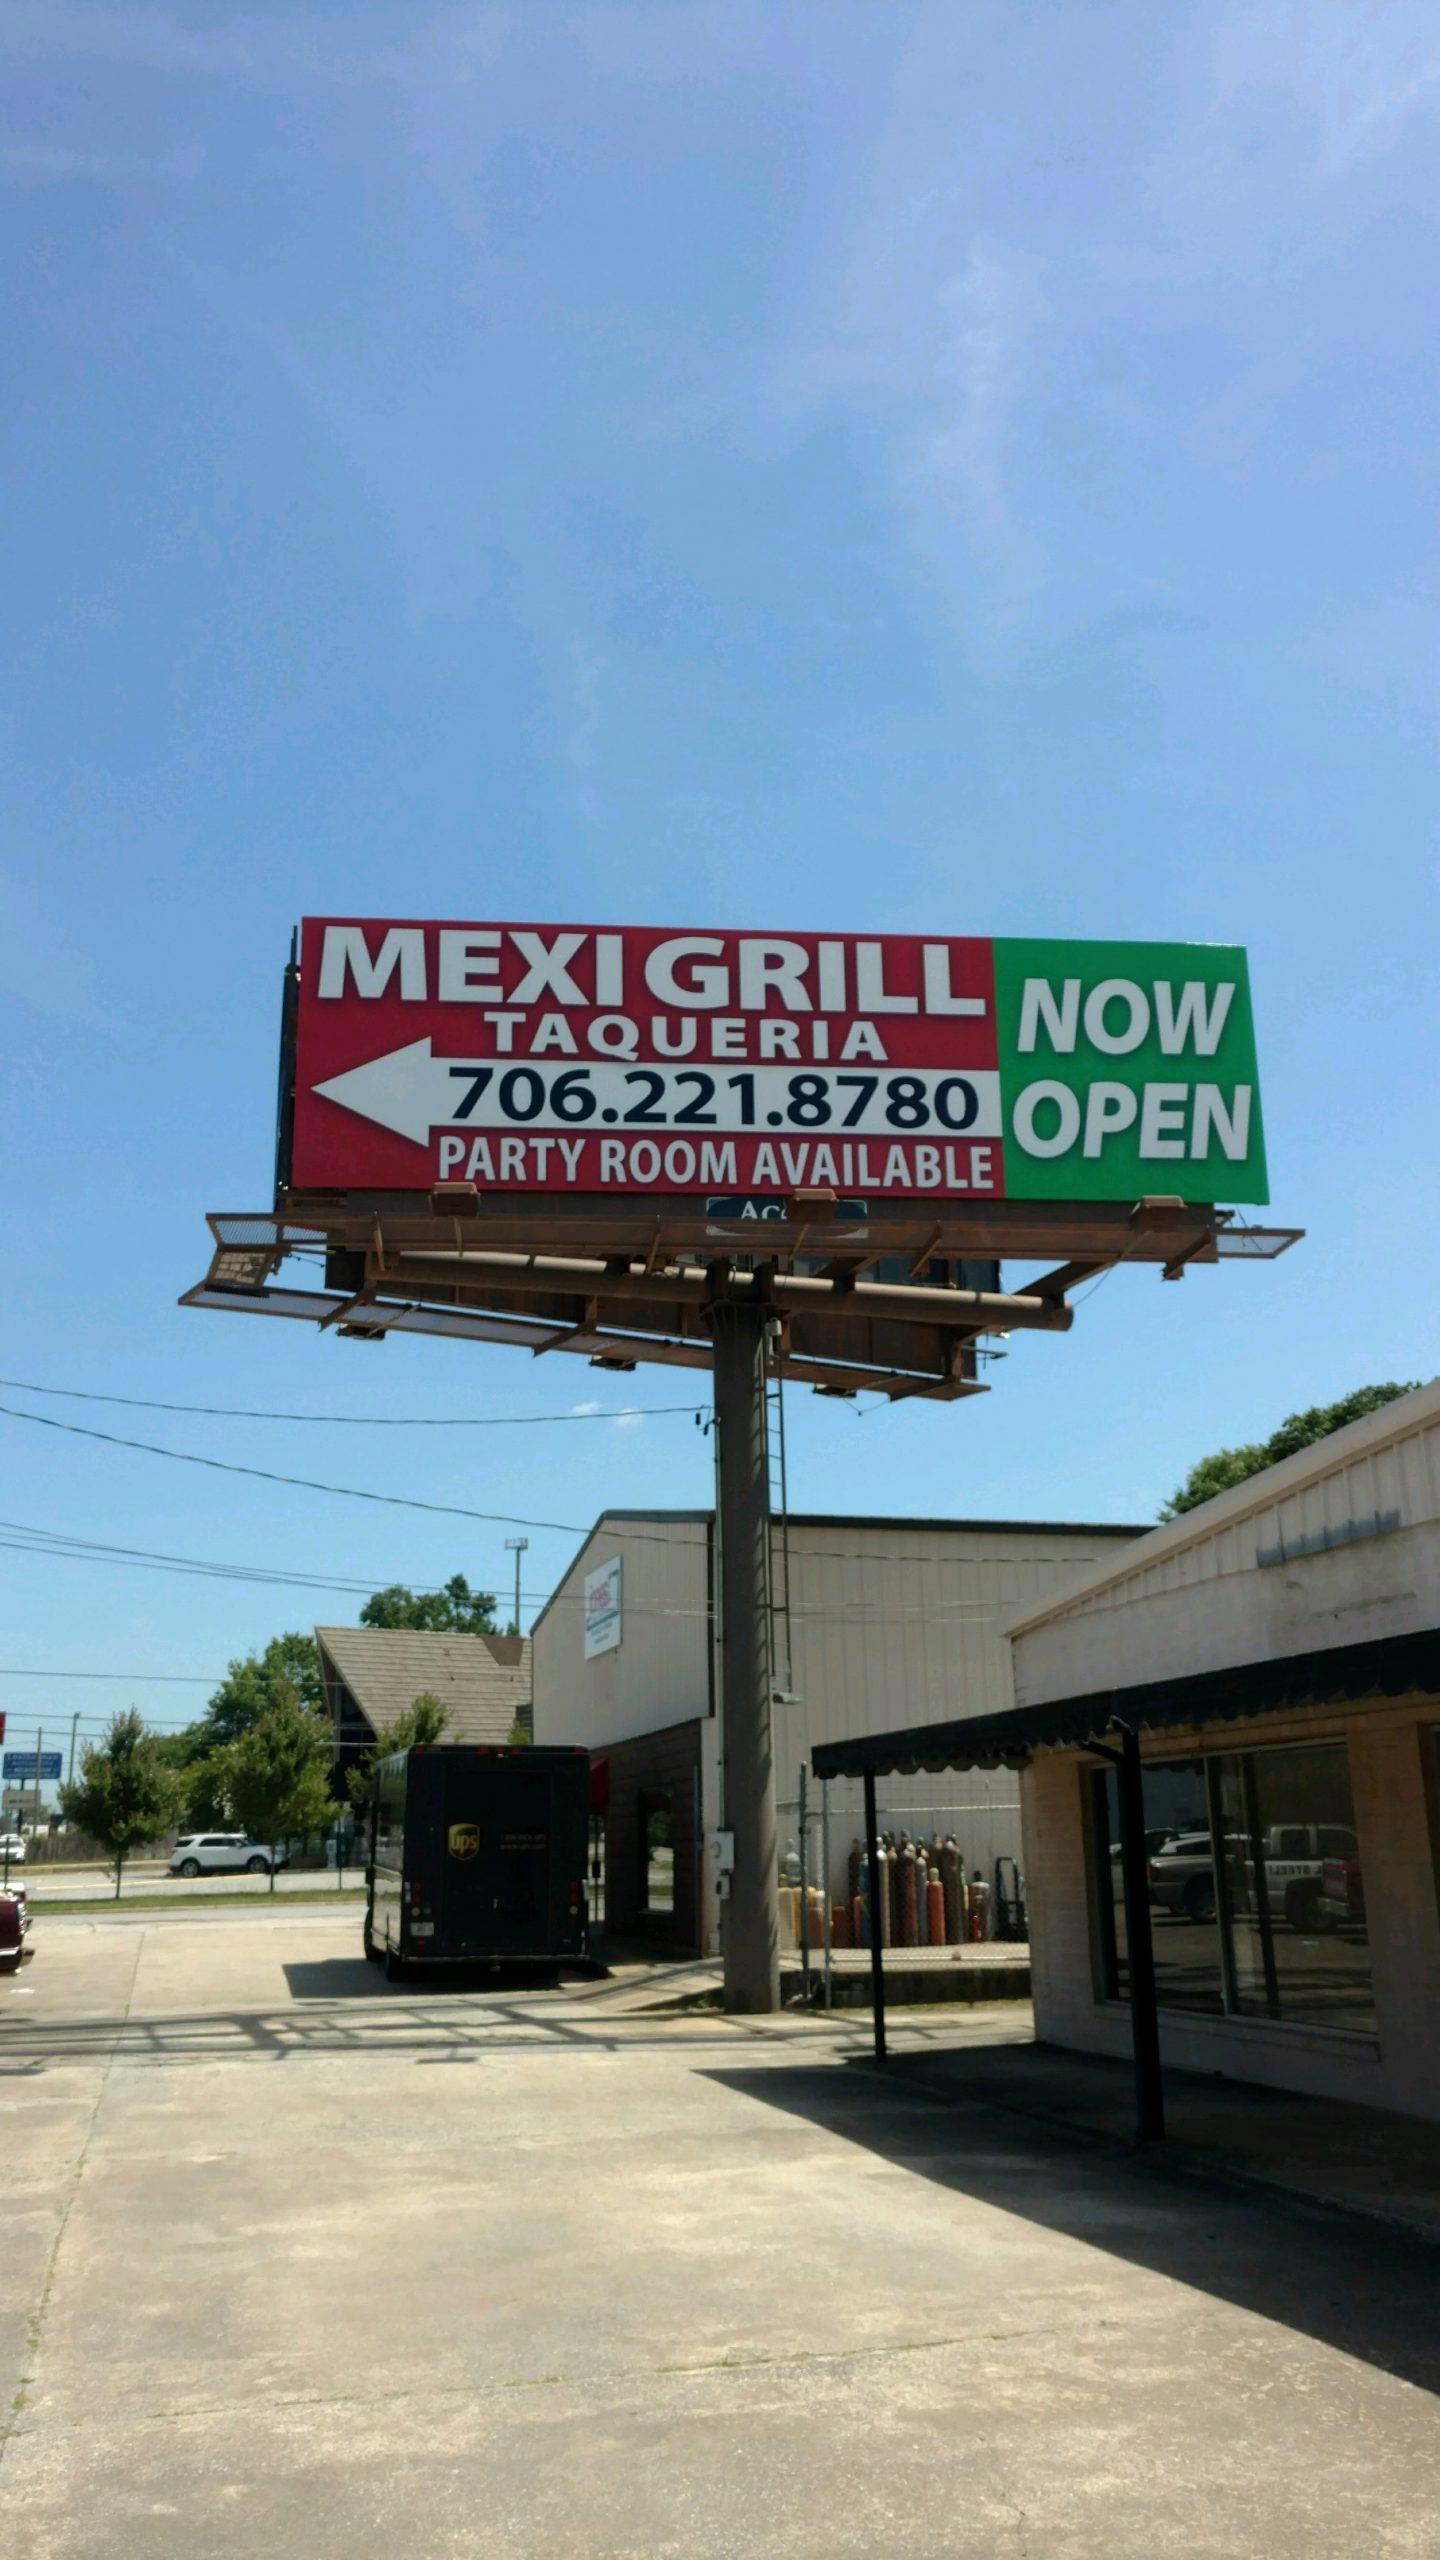 Outdoor-Advertising-Sign #659.1 RHR CU - 5-30-19 (1)